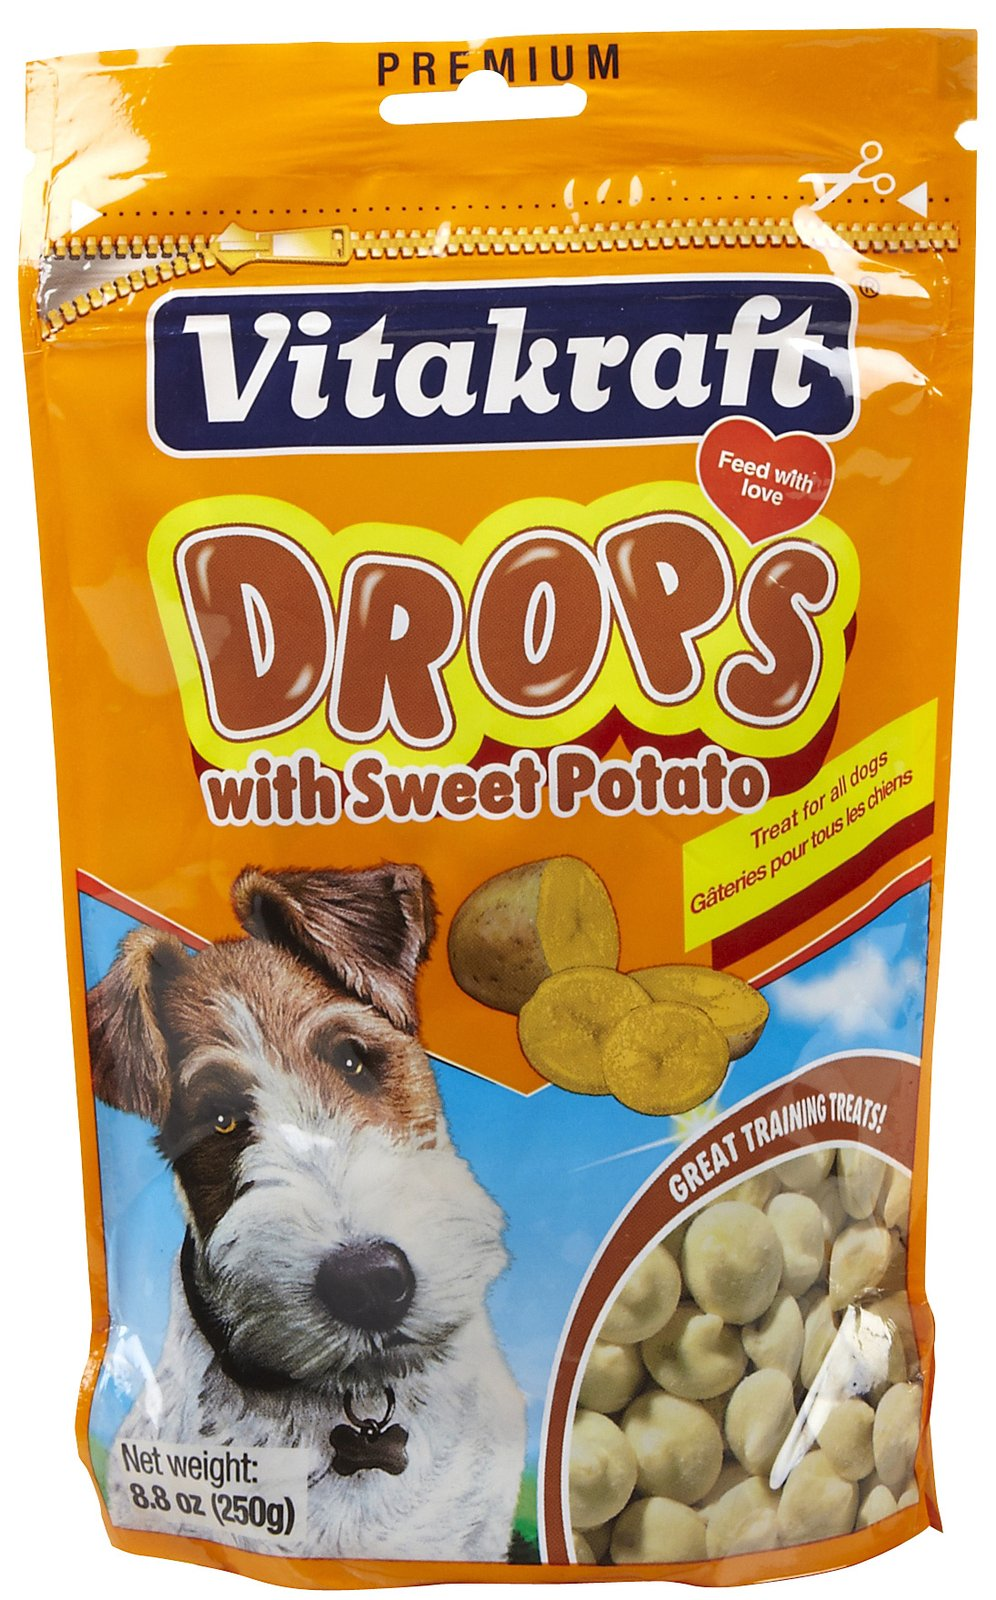 Vitakraft Drops Dog Treat